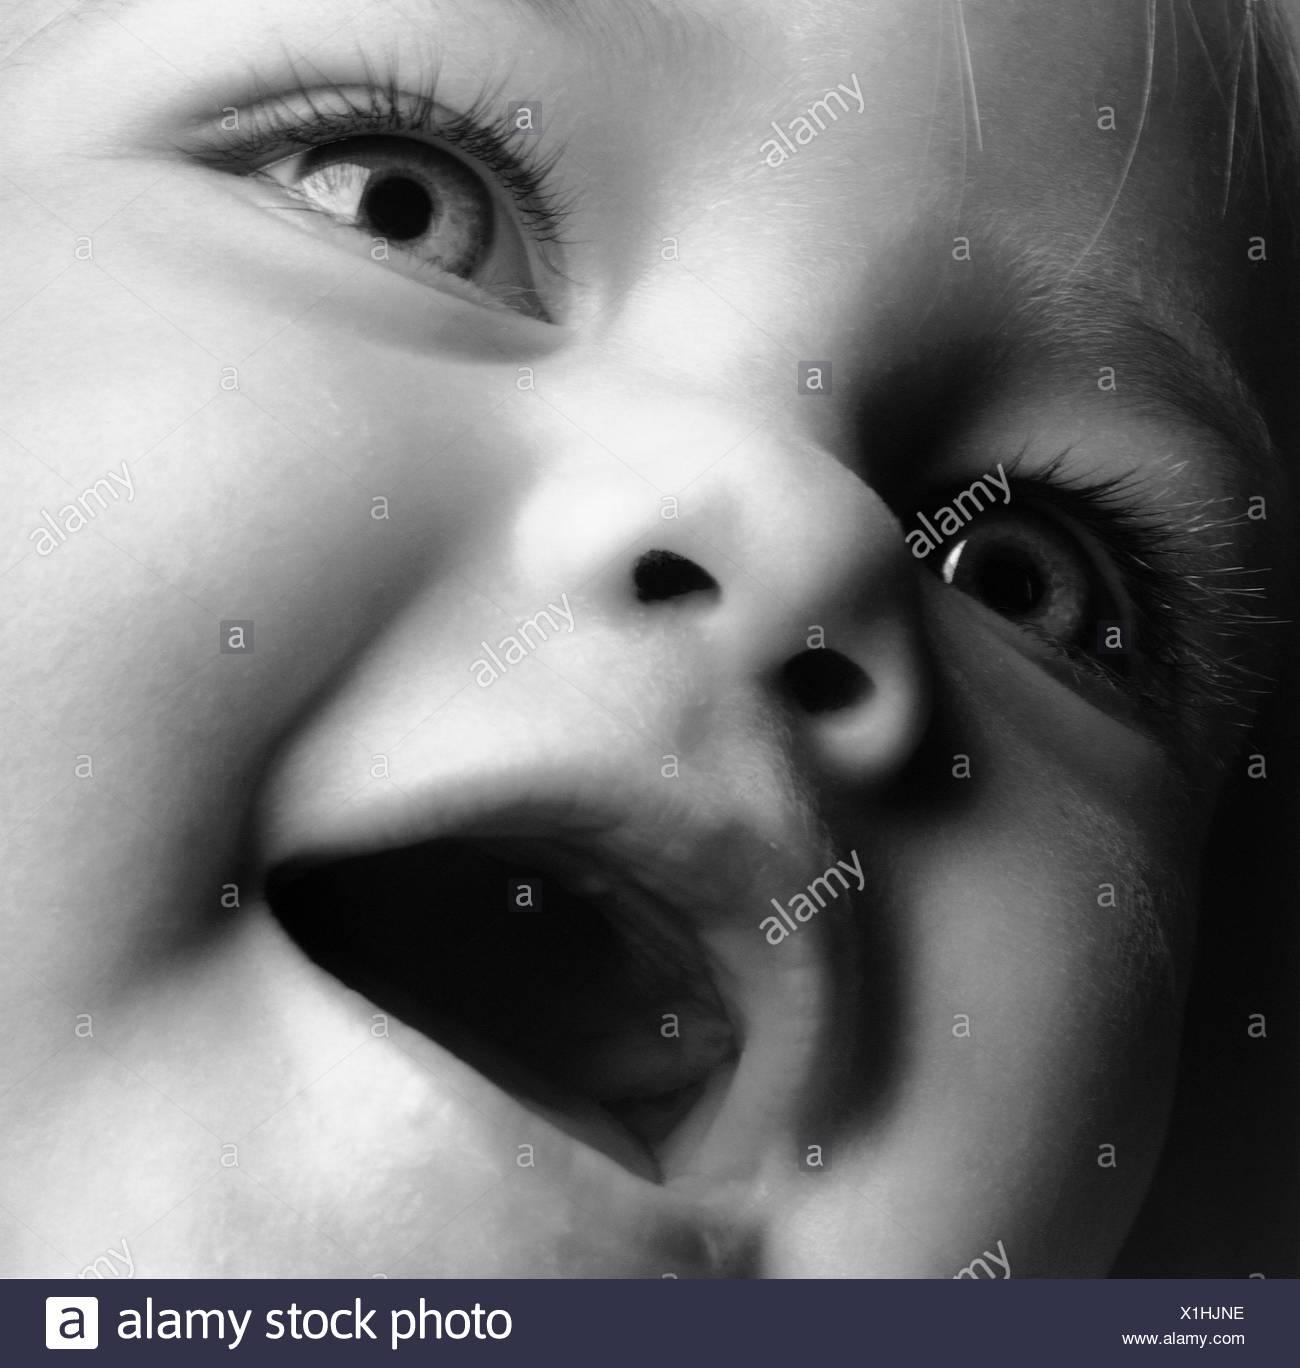 Fl2532 nick kelsh close up babyìs eyes mouth